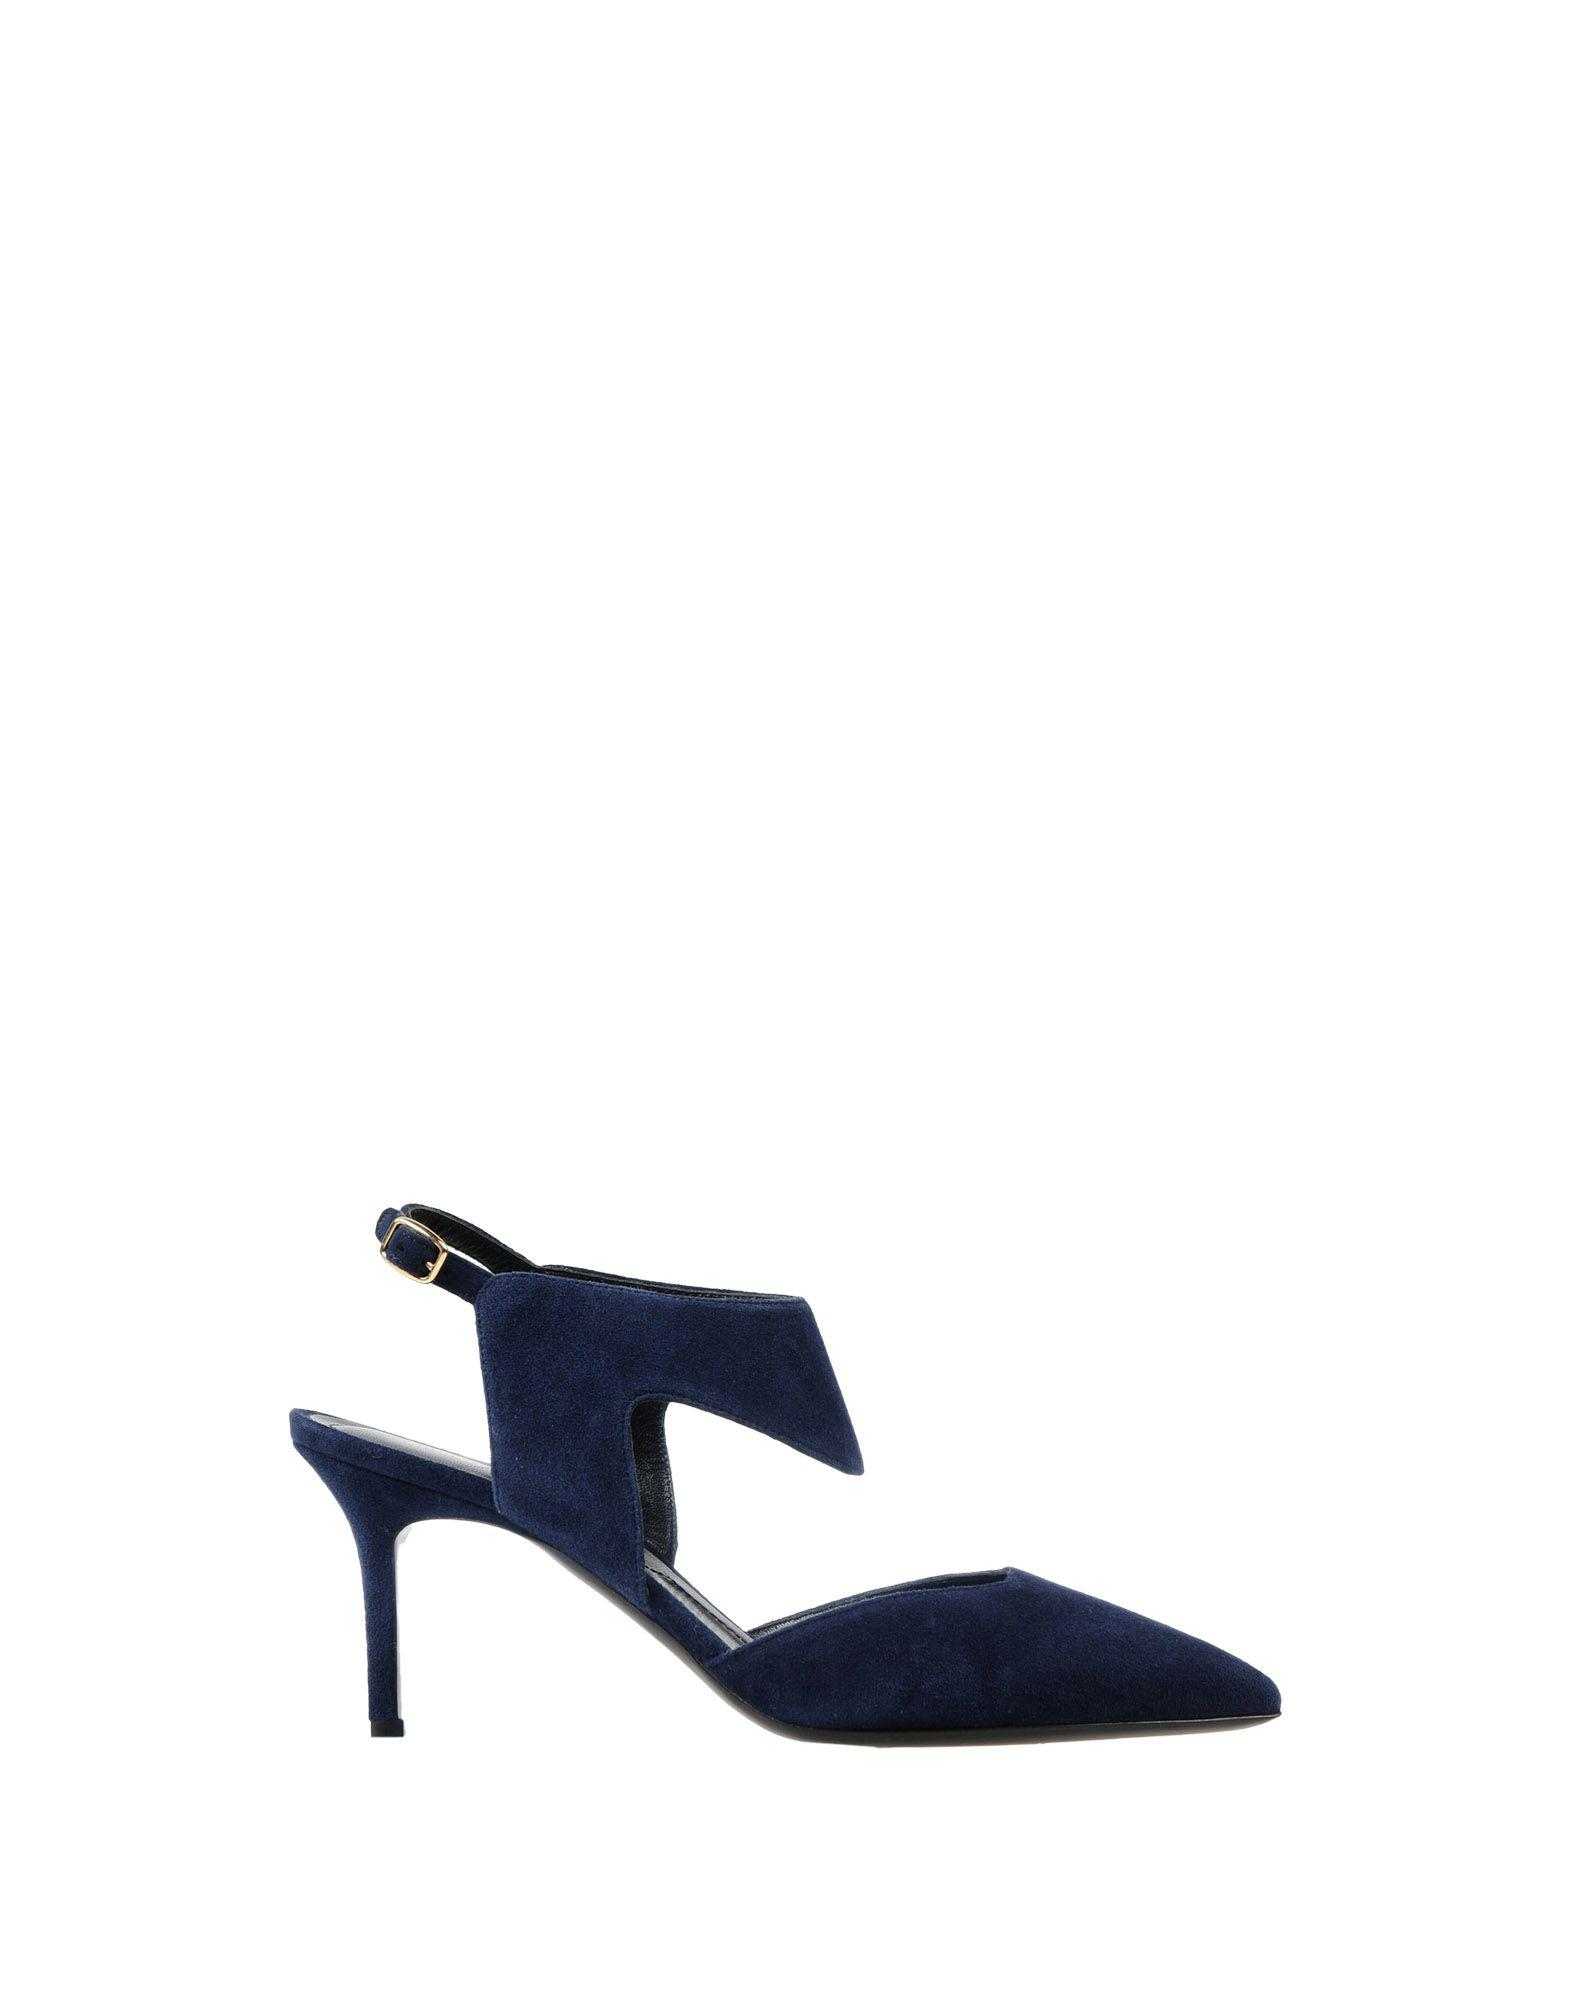 Nicholas Kirkwood Leda Suede Sandals w/ Tags free shipping sale ysibAkUe3